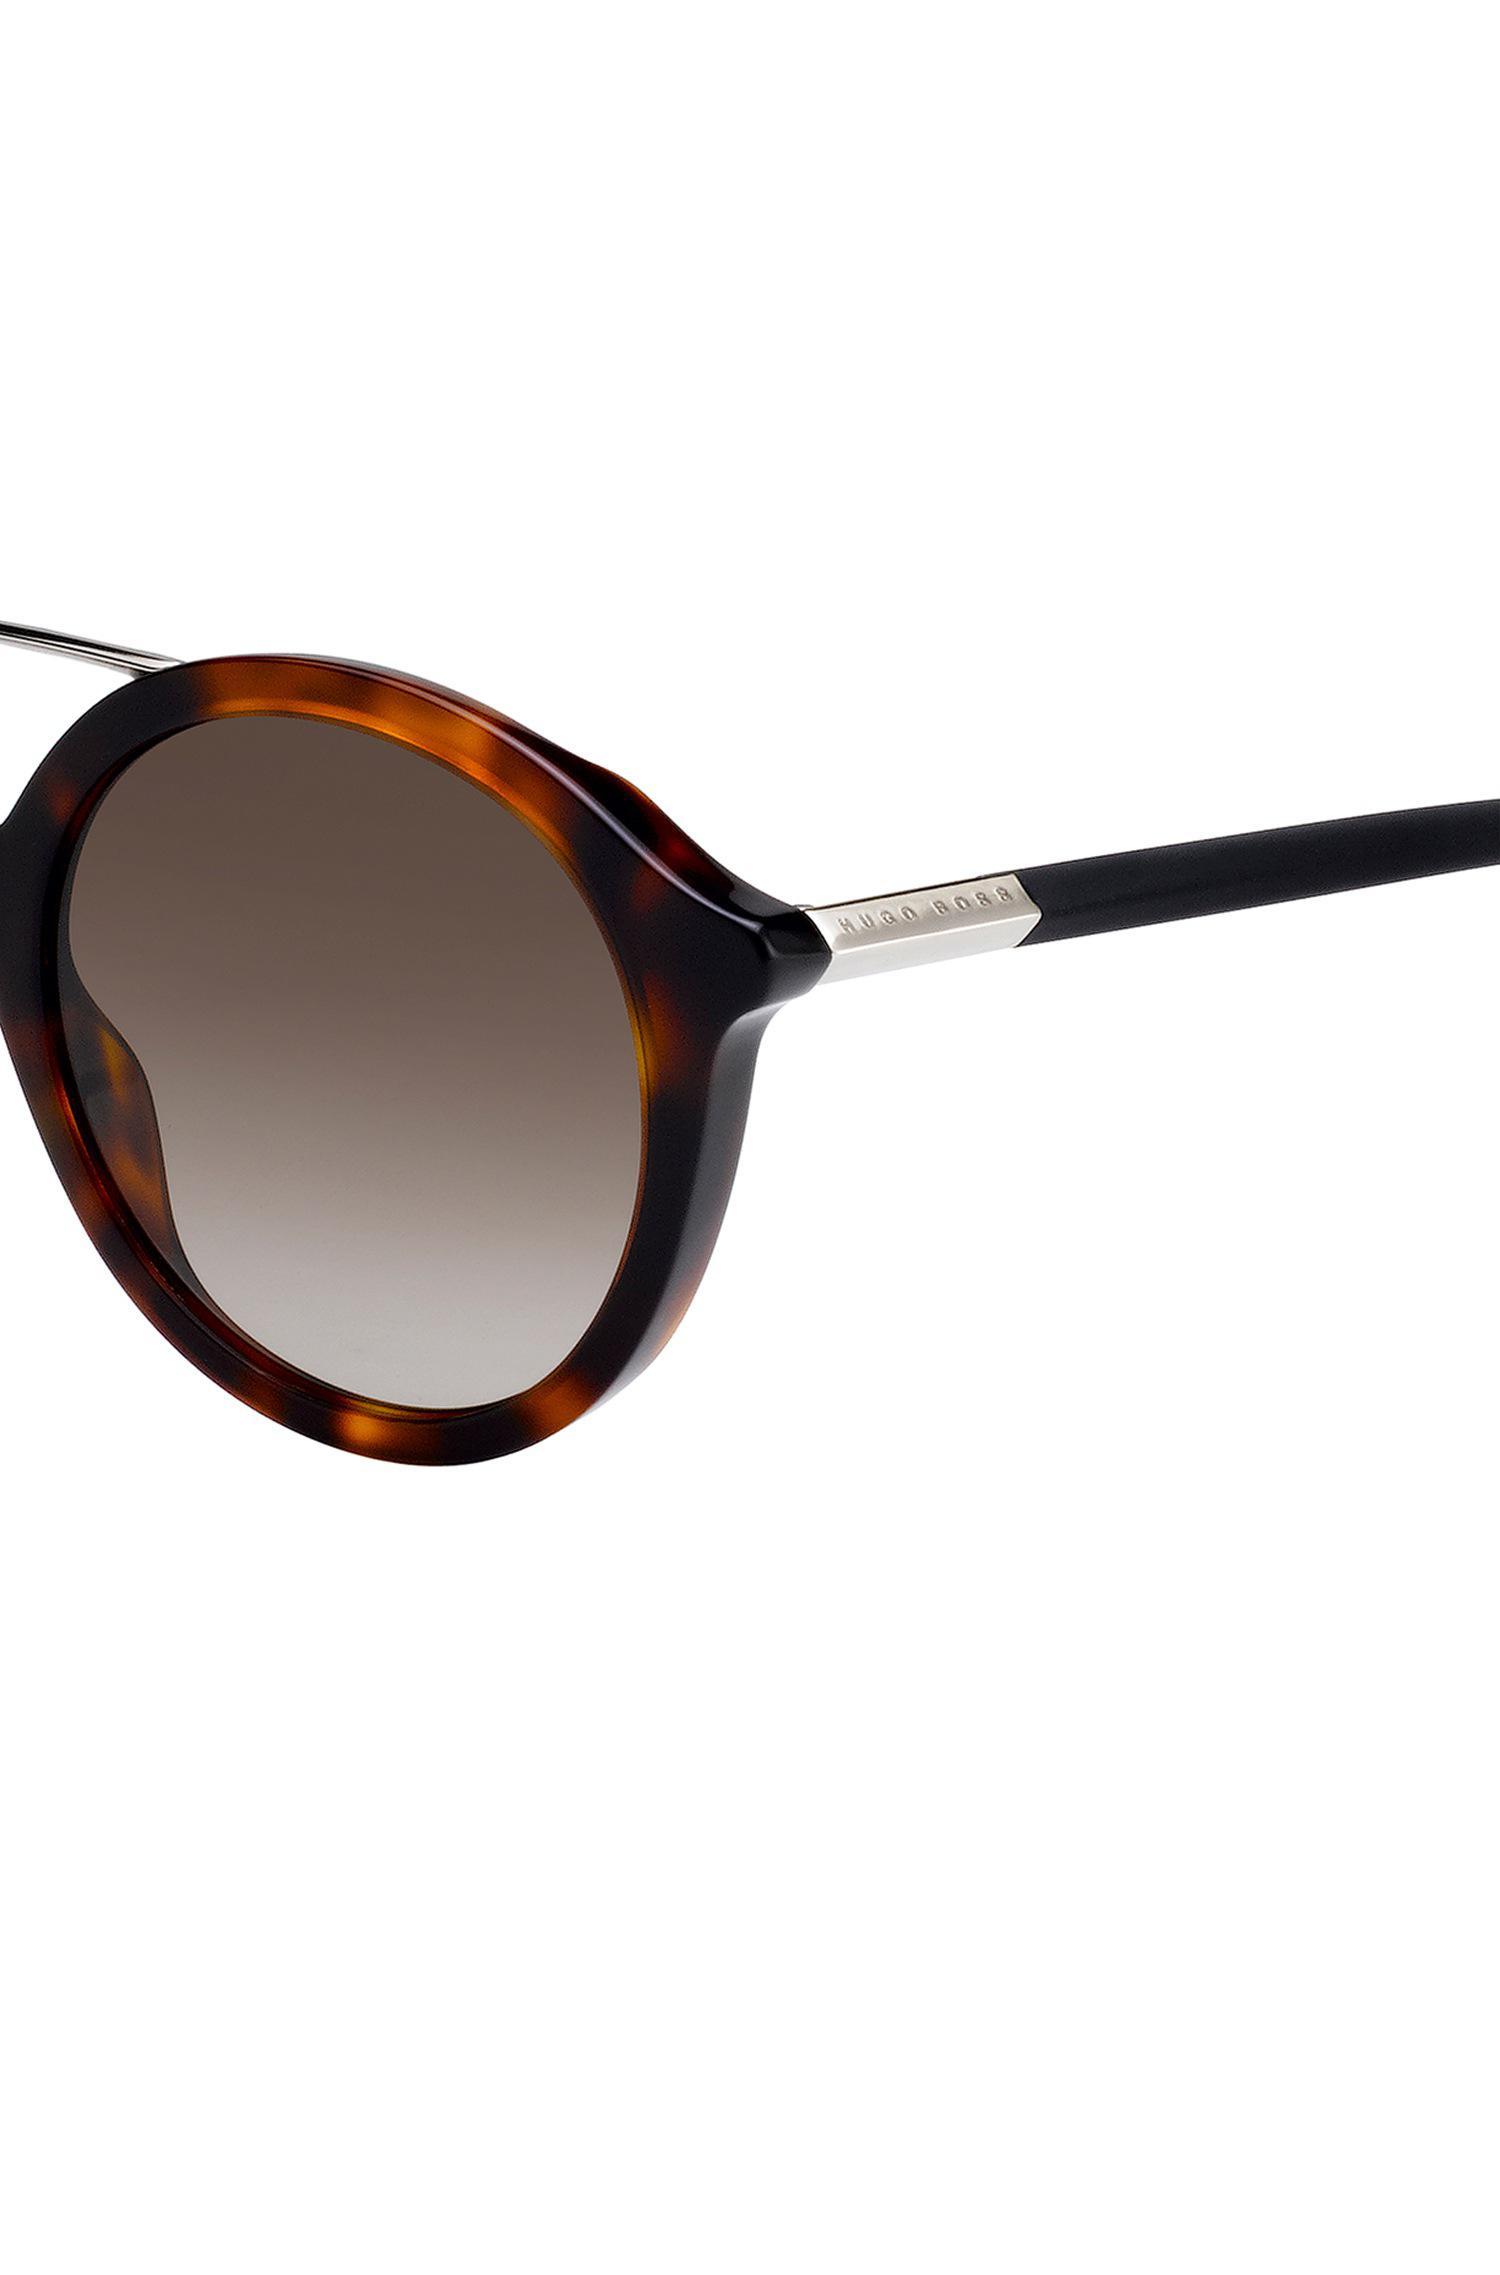 Boss Double-bridge Sunglasses With Havana-pattern Frames in Brown - Lyst